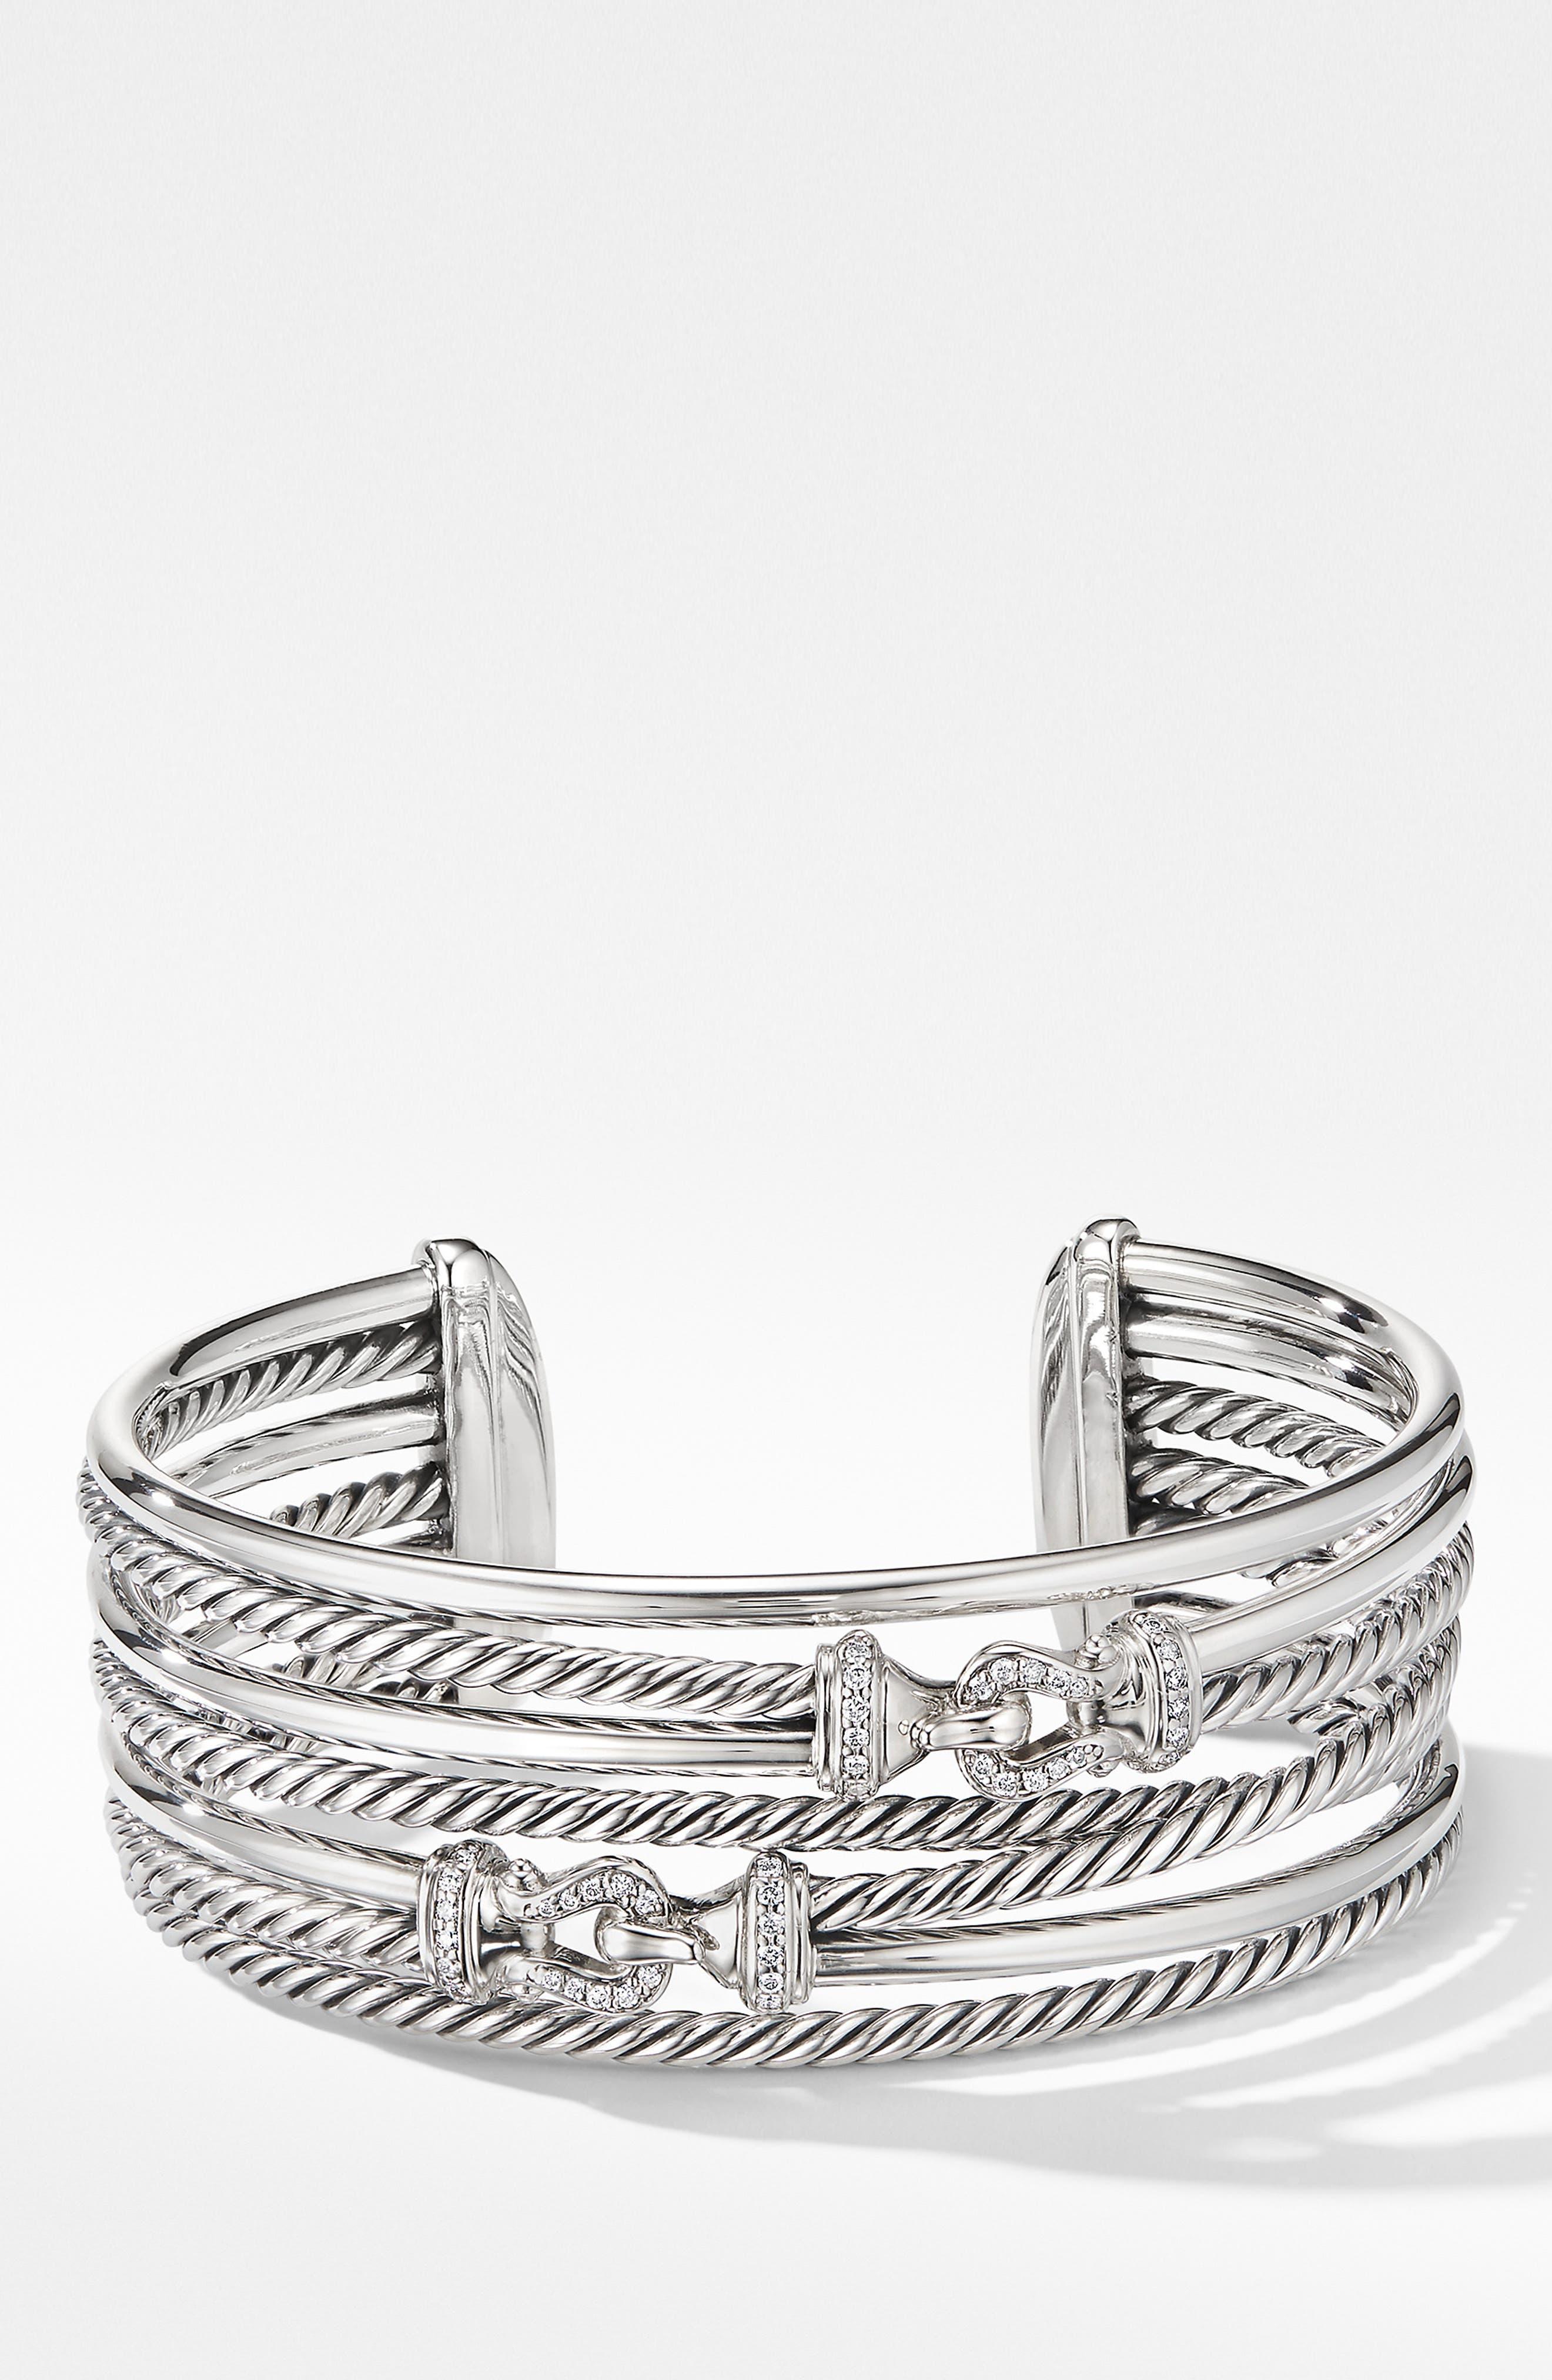 DAVID YURMAN Buckle Crossover Cuff Bracelet with Diamonds, Main, color, SILVER/ DIAMOND